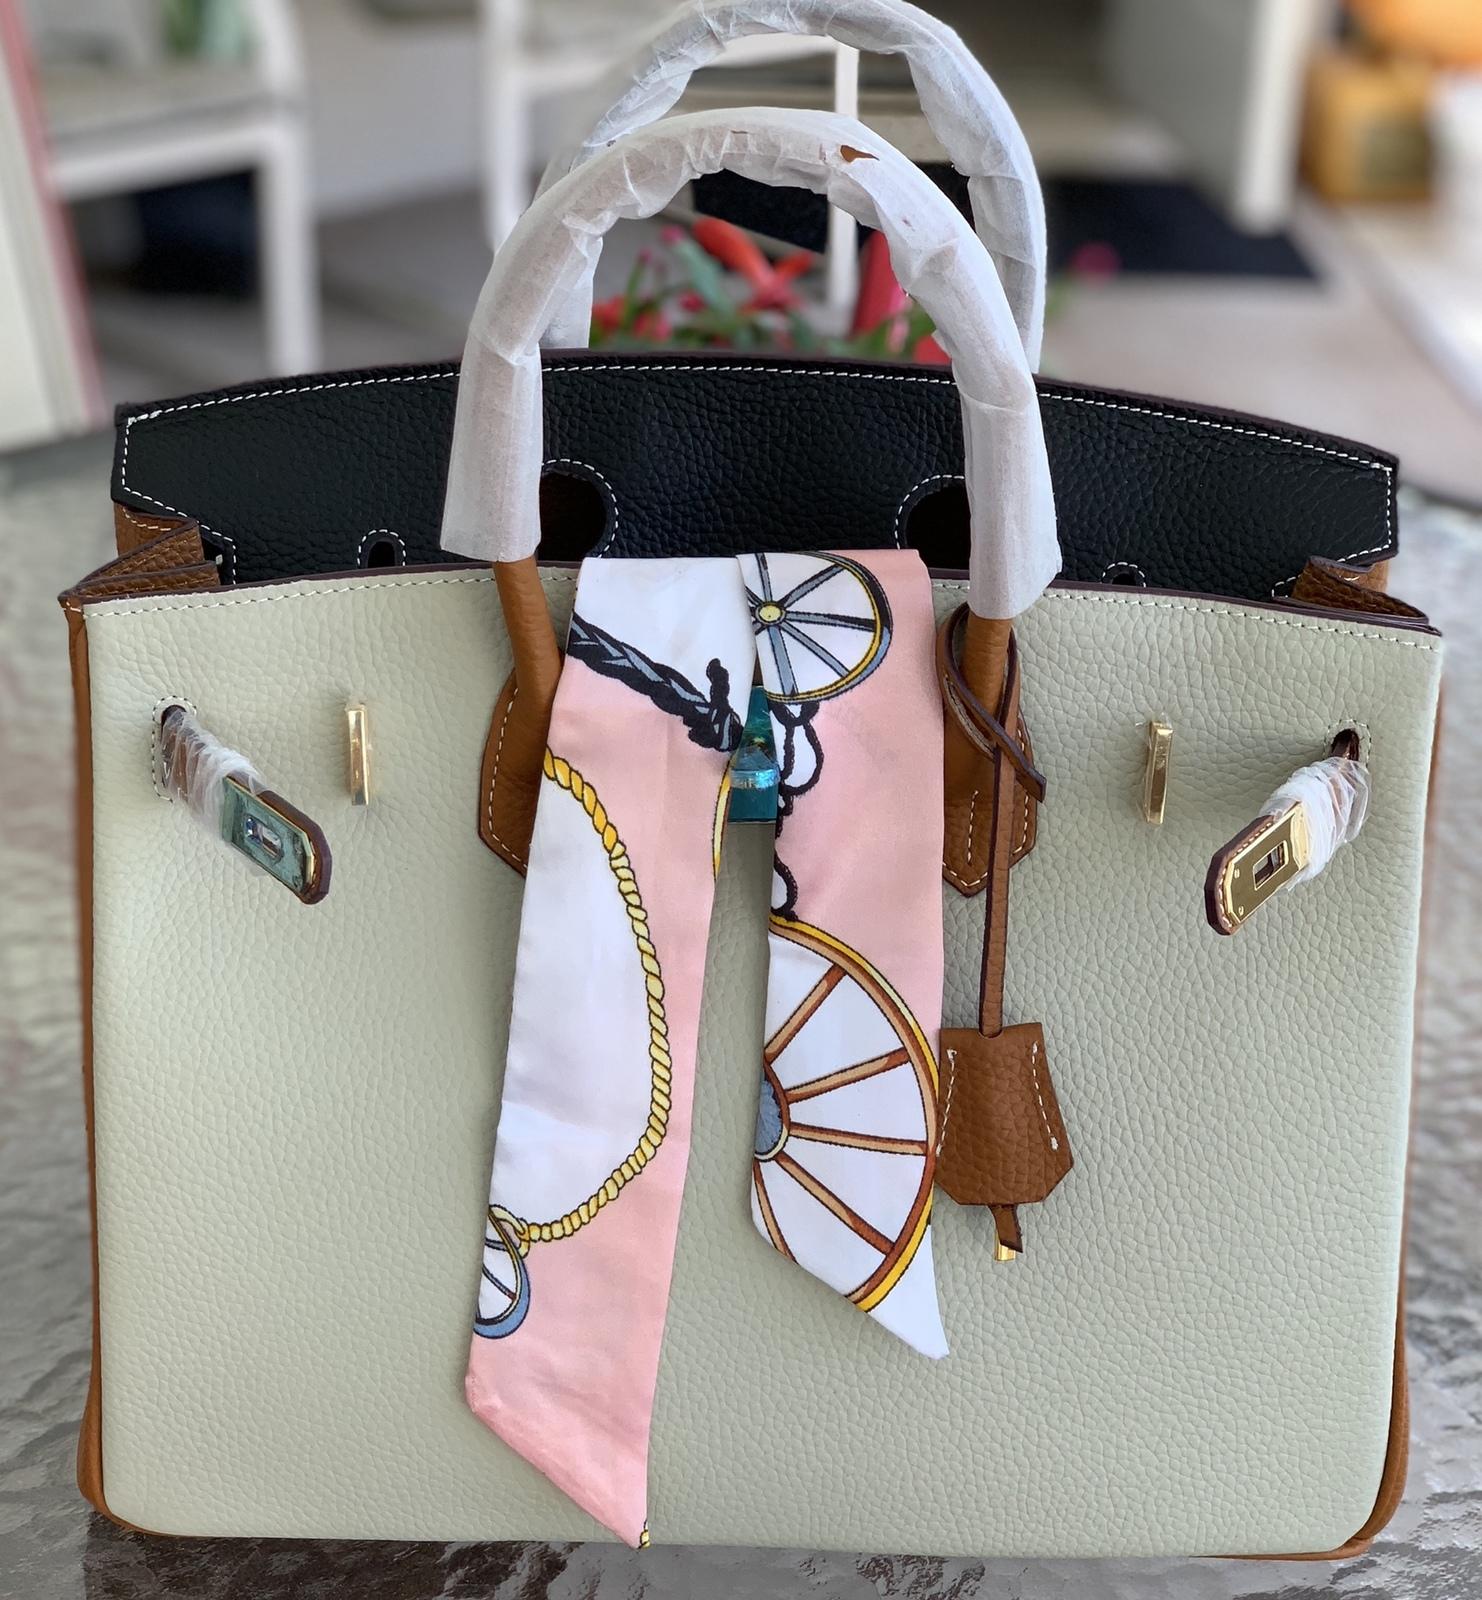 25cm Color Block Pebbled Italian Leather Birkin Style Lock Satchel Handbag1998S